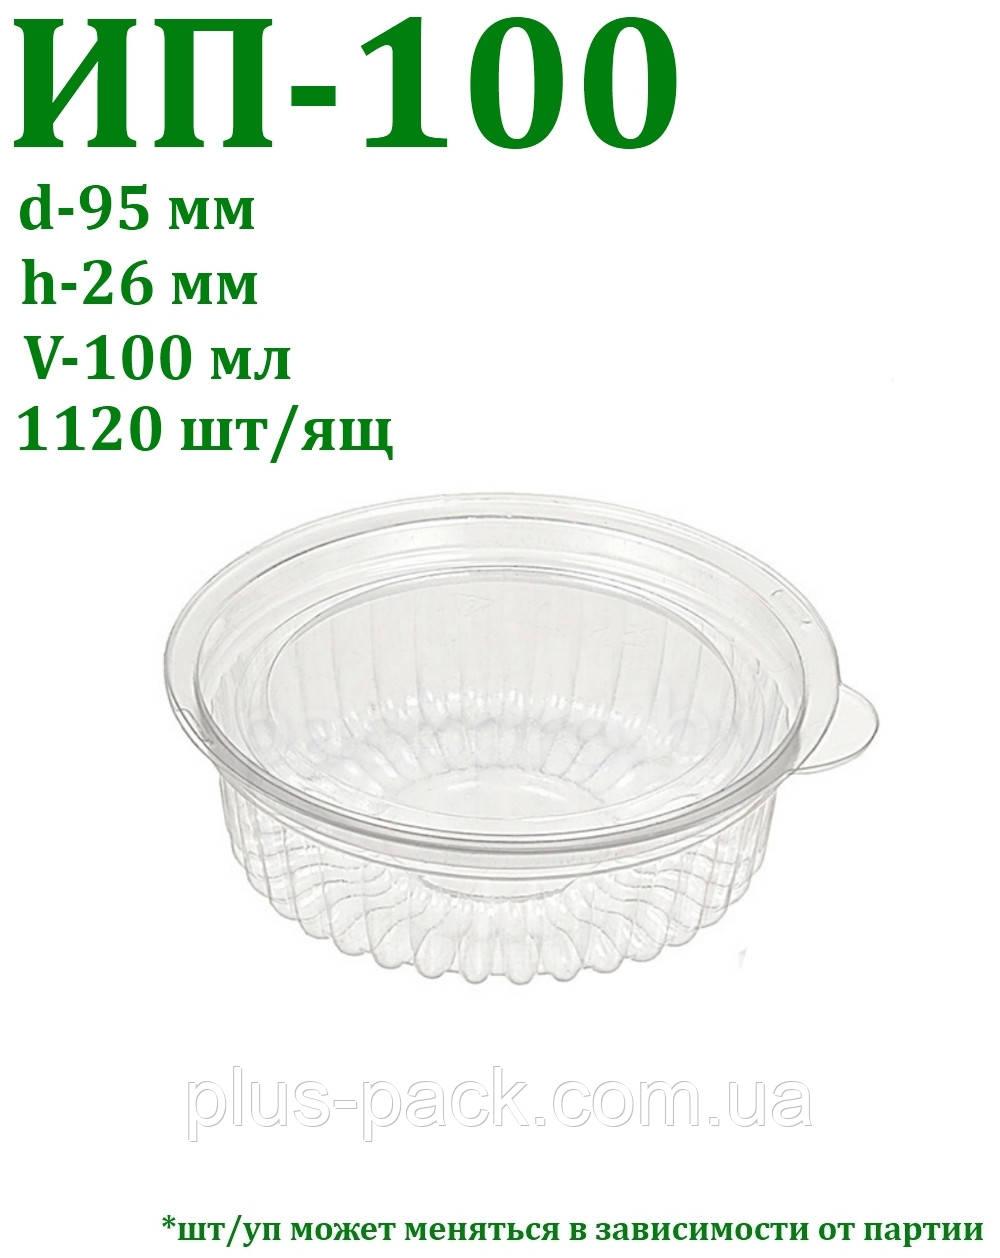 Одноразовый, круглый салатник